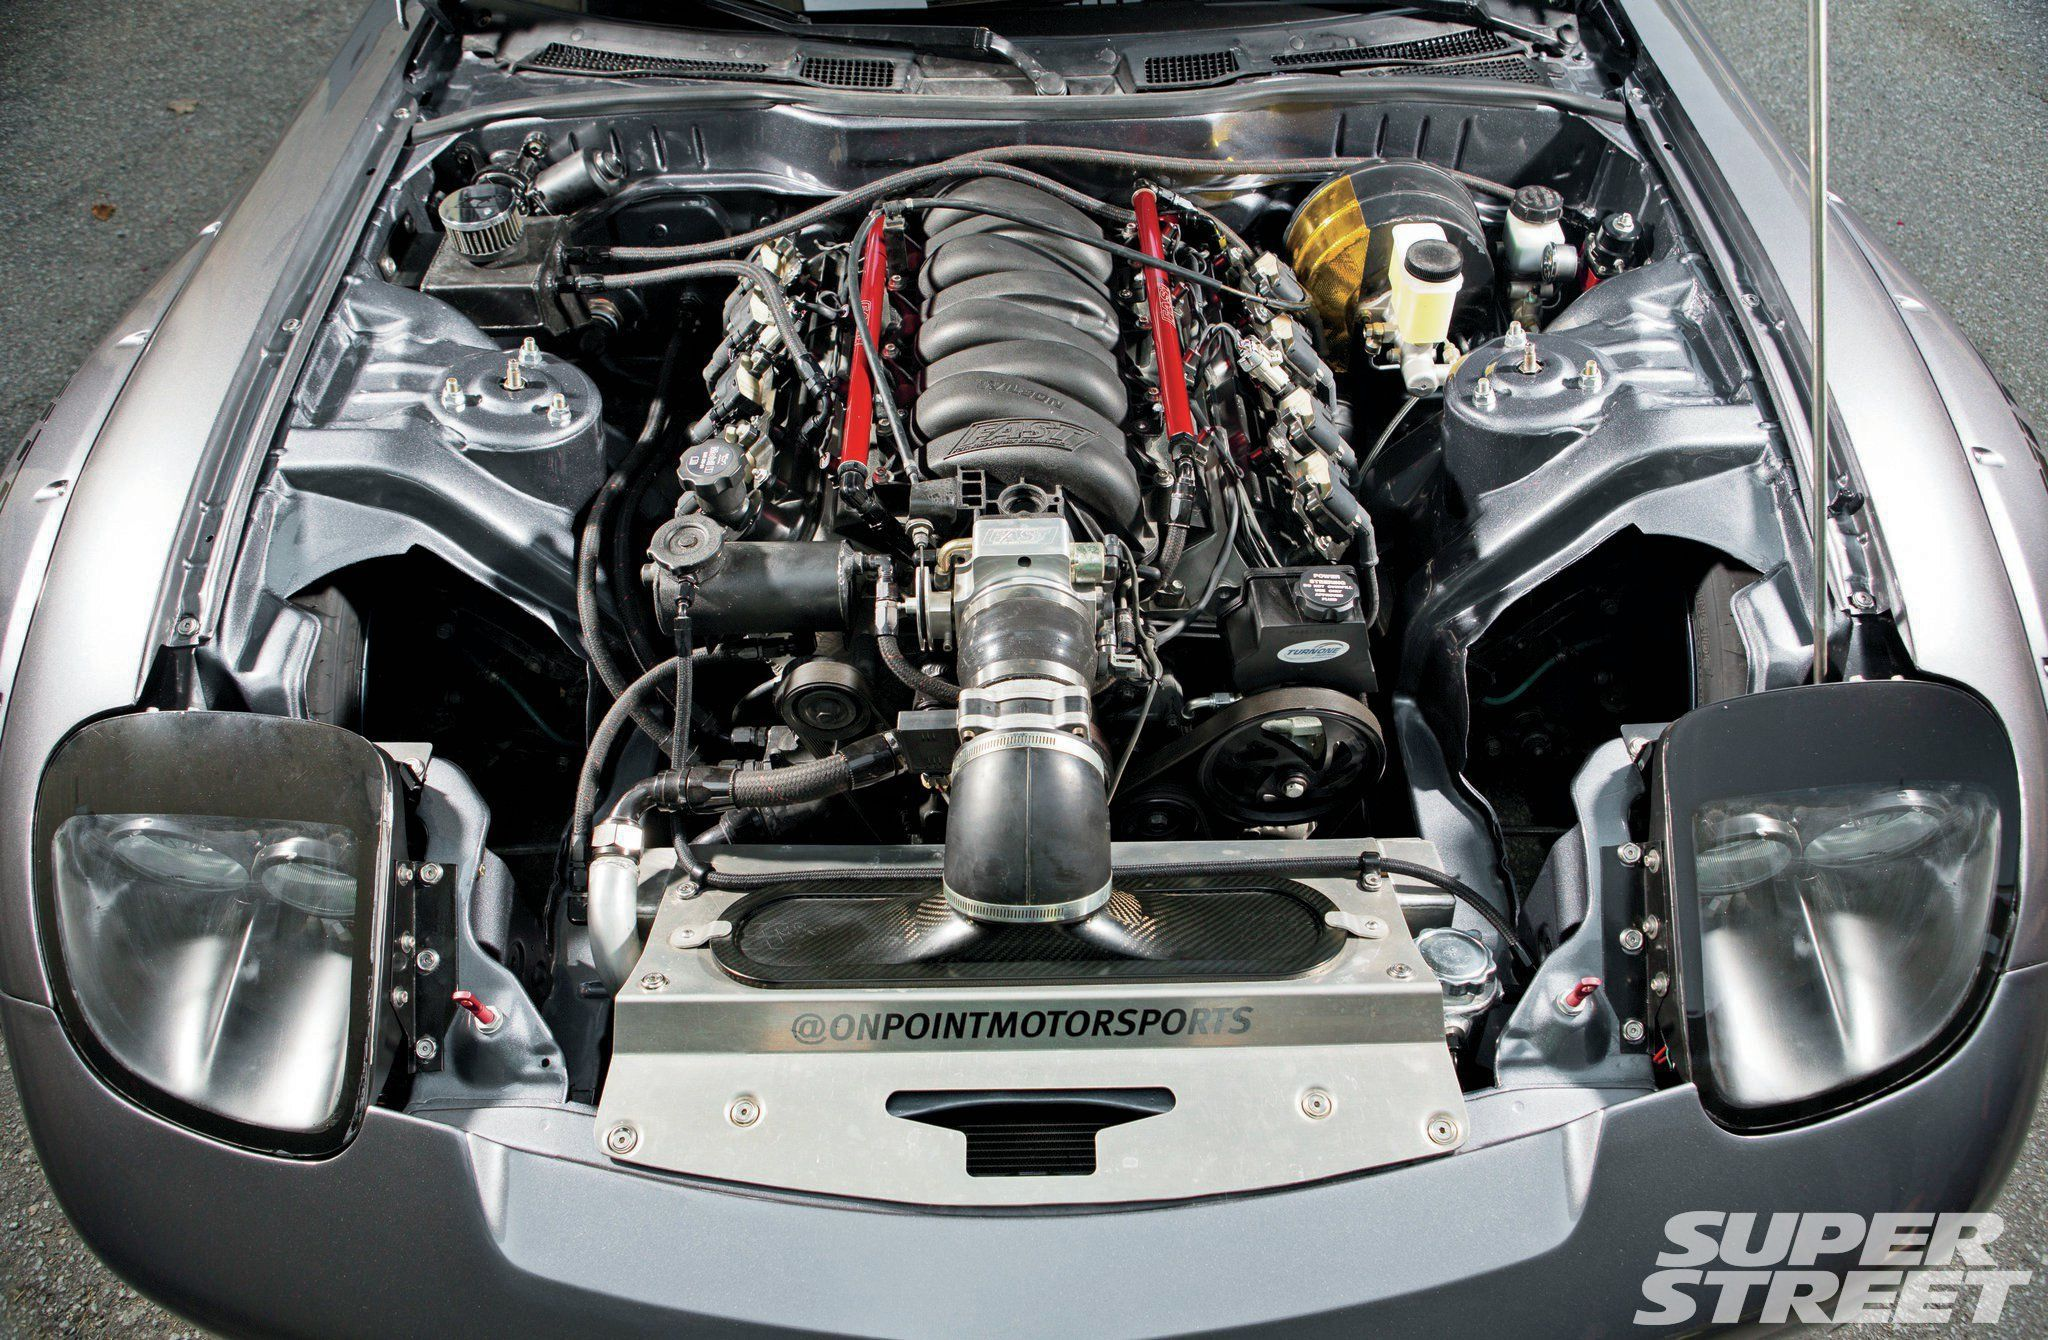 1993 mazda rx7 gm ls1 engine 06 [ 2048 x 1340 Pixel ]